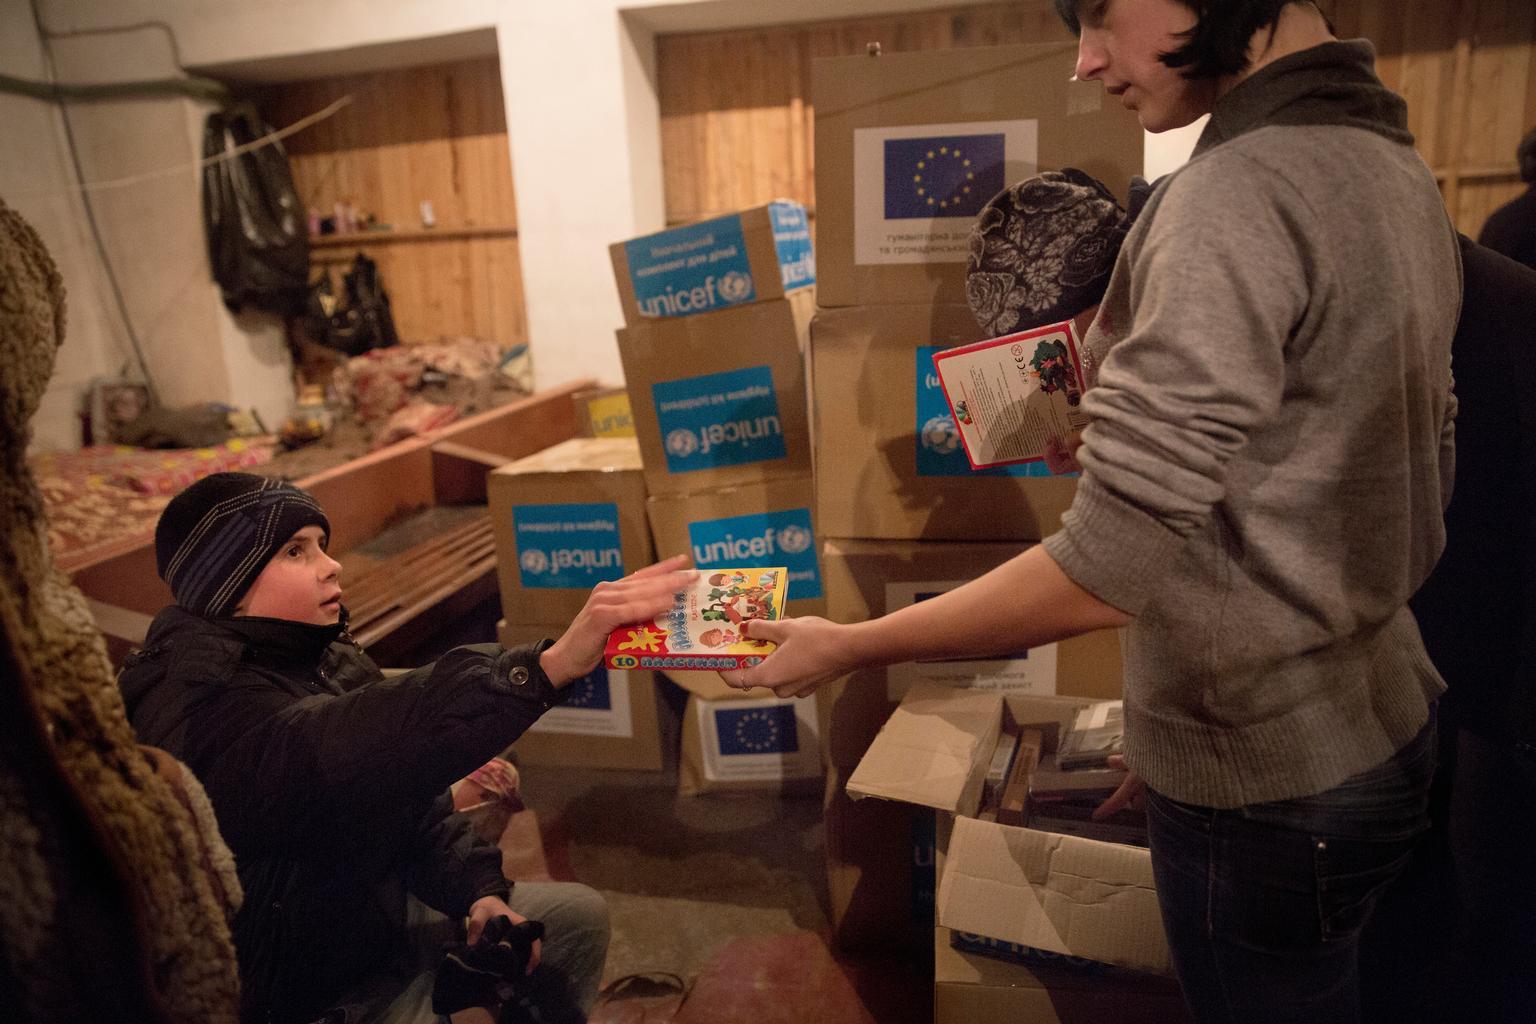 © UNICEF/NYHQ2014-3503/Volpi